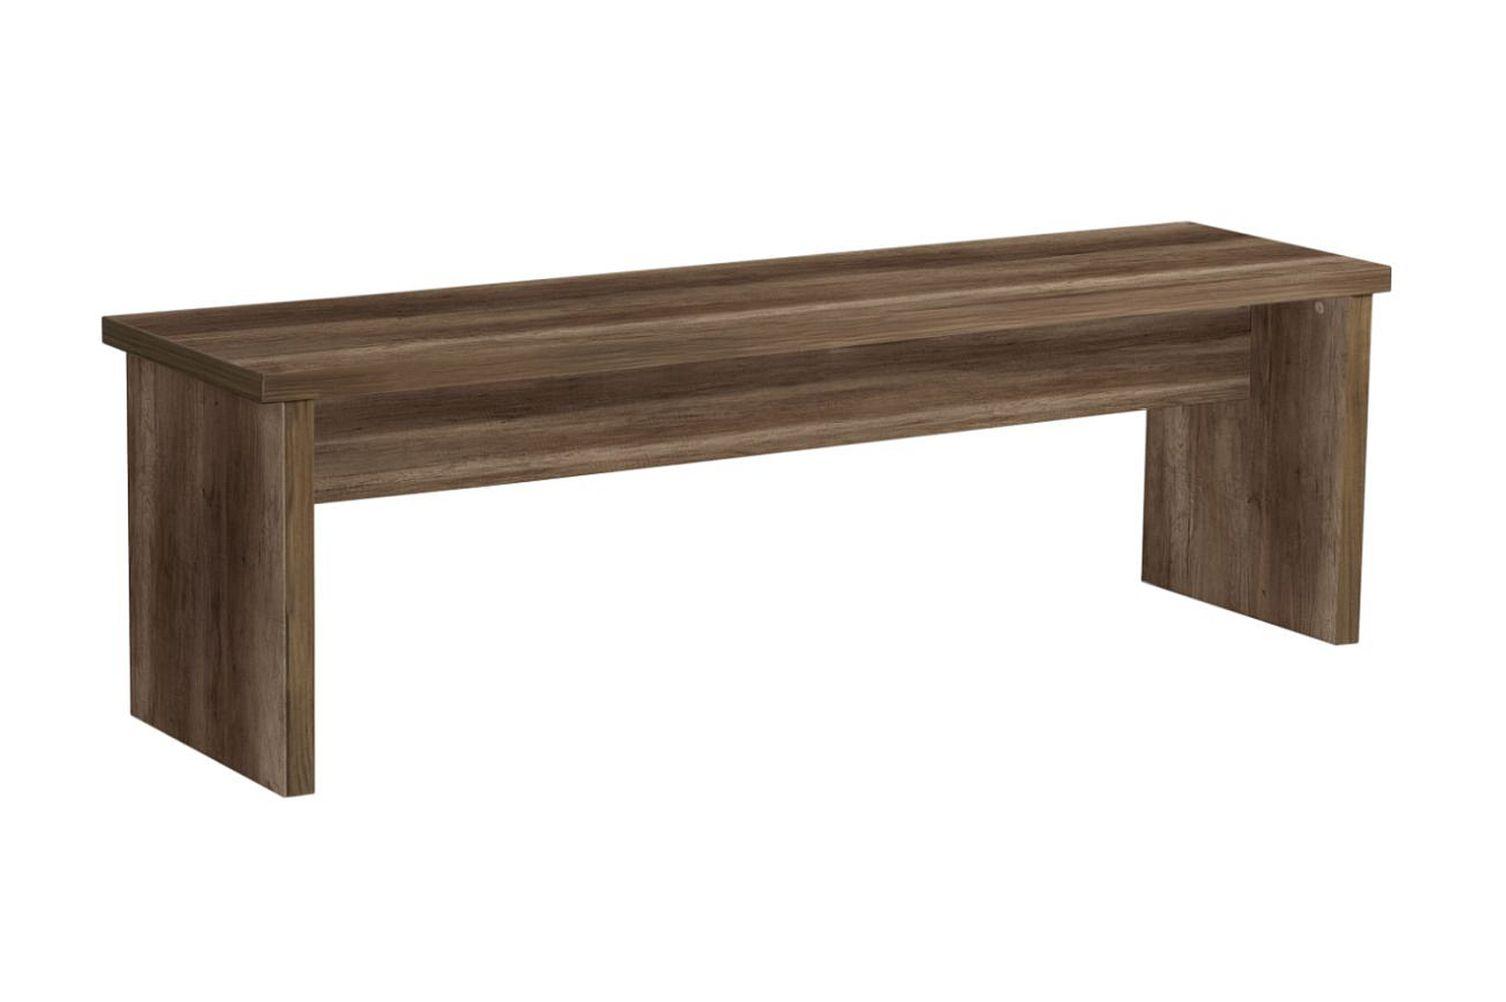 Sitzbank 0585/160 wildeiche trüffel